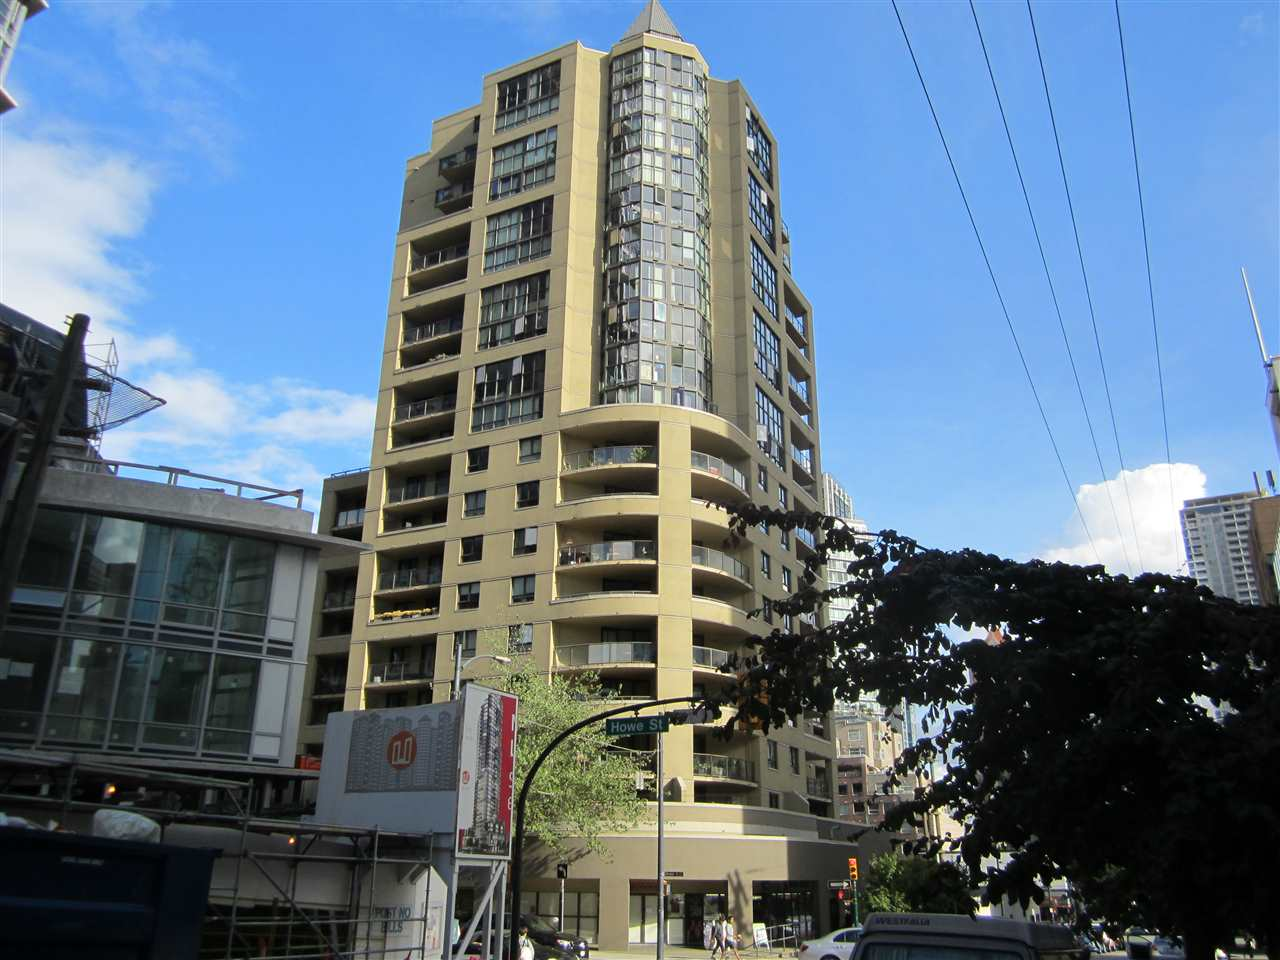 Condo Apartment at 706 789 DRAKE STREET, Unit 706, Vancouver West, British Columbia. Image 1